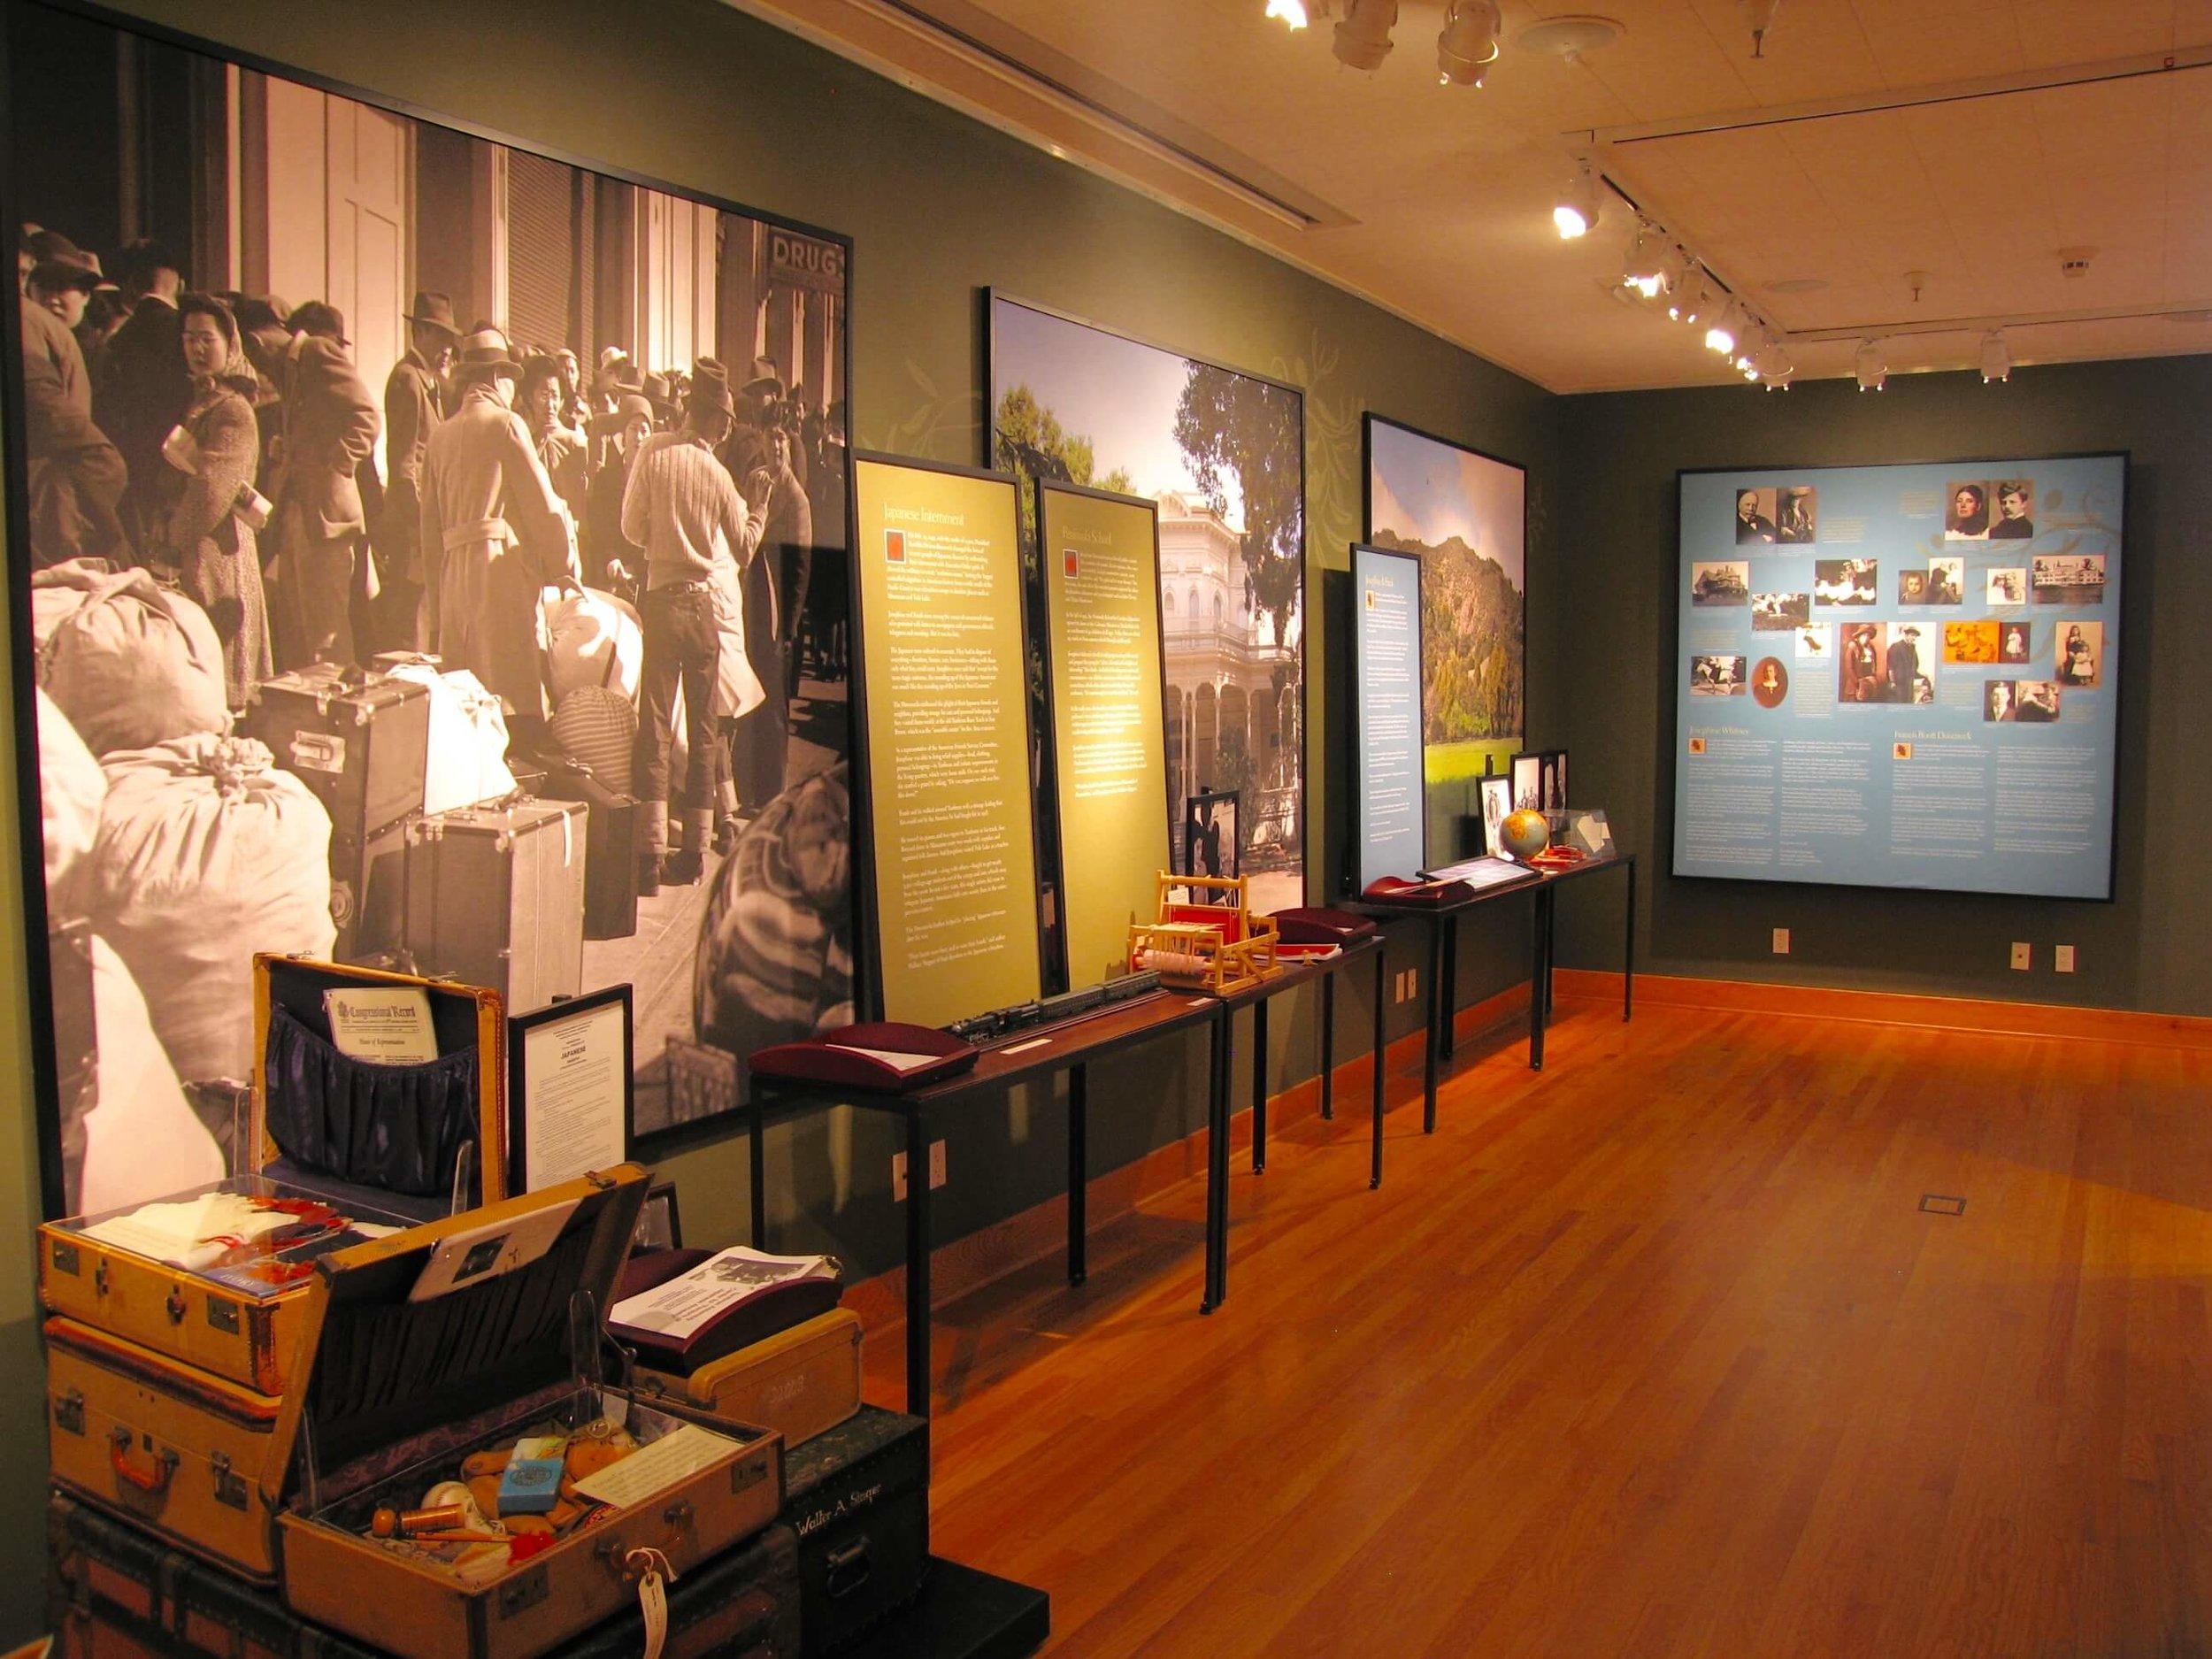 2-Los-Altos-History-Museum-The Sibbett Group-Gallery .jpg